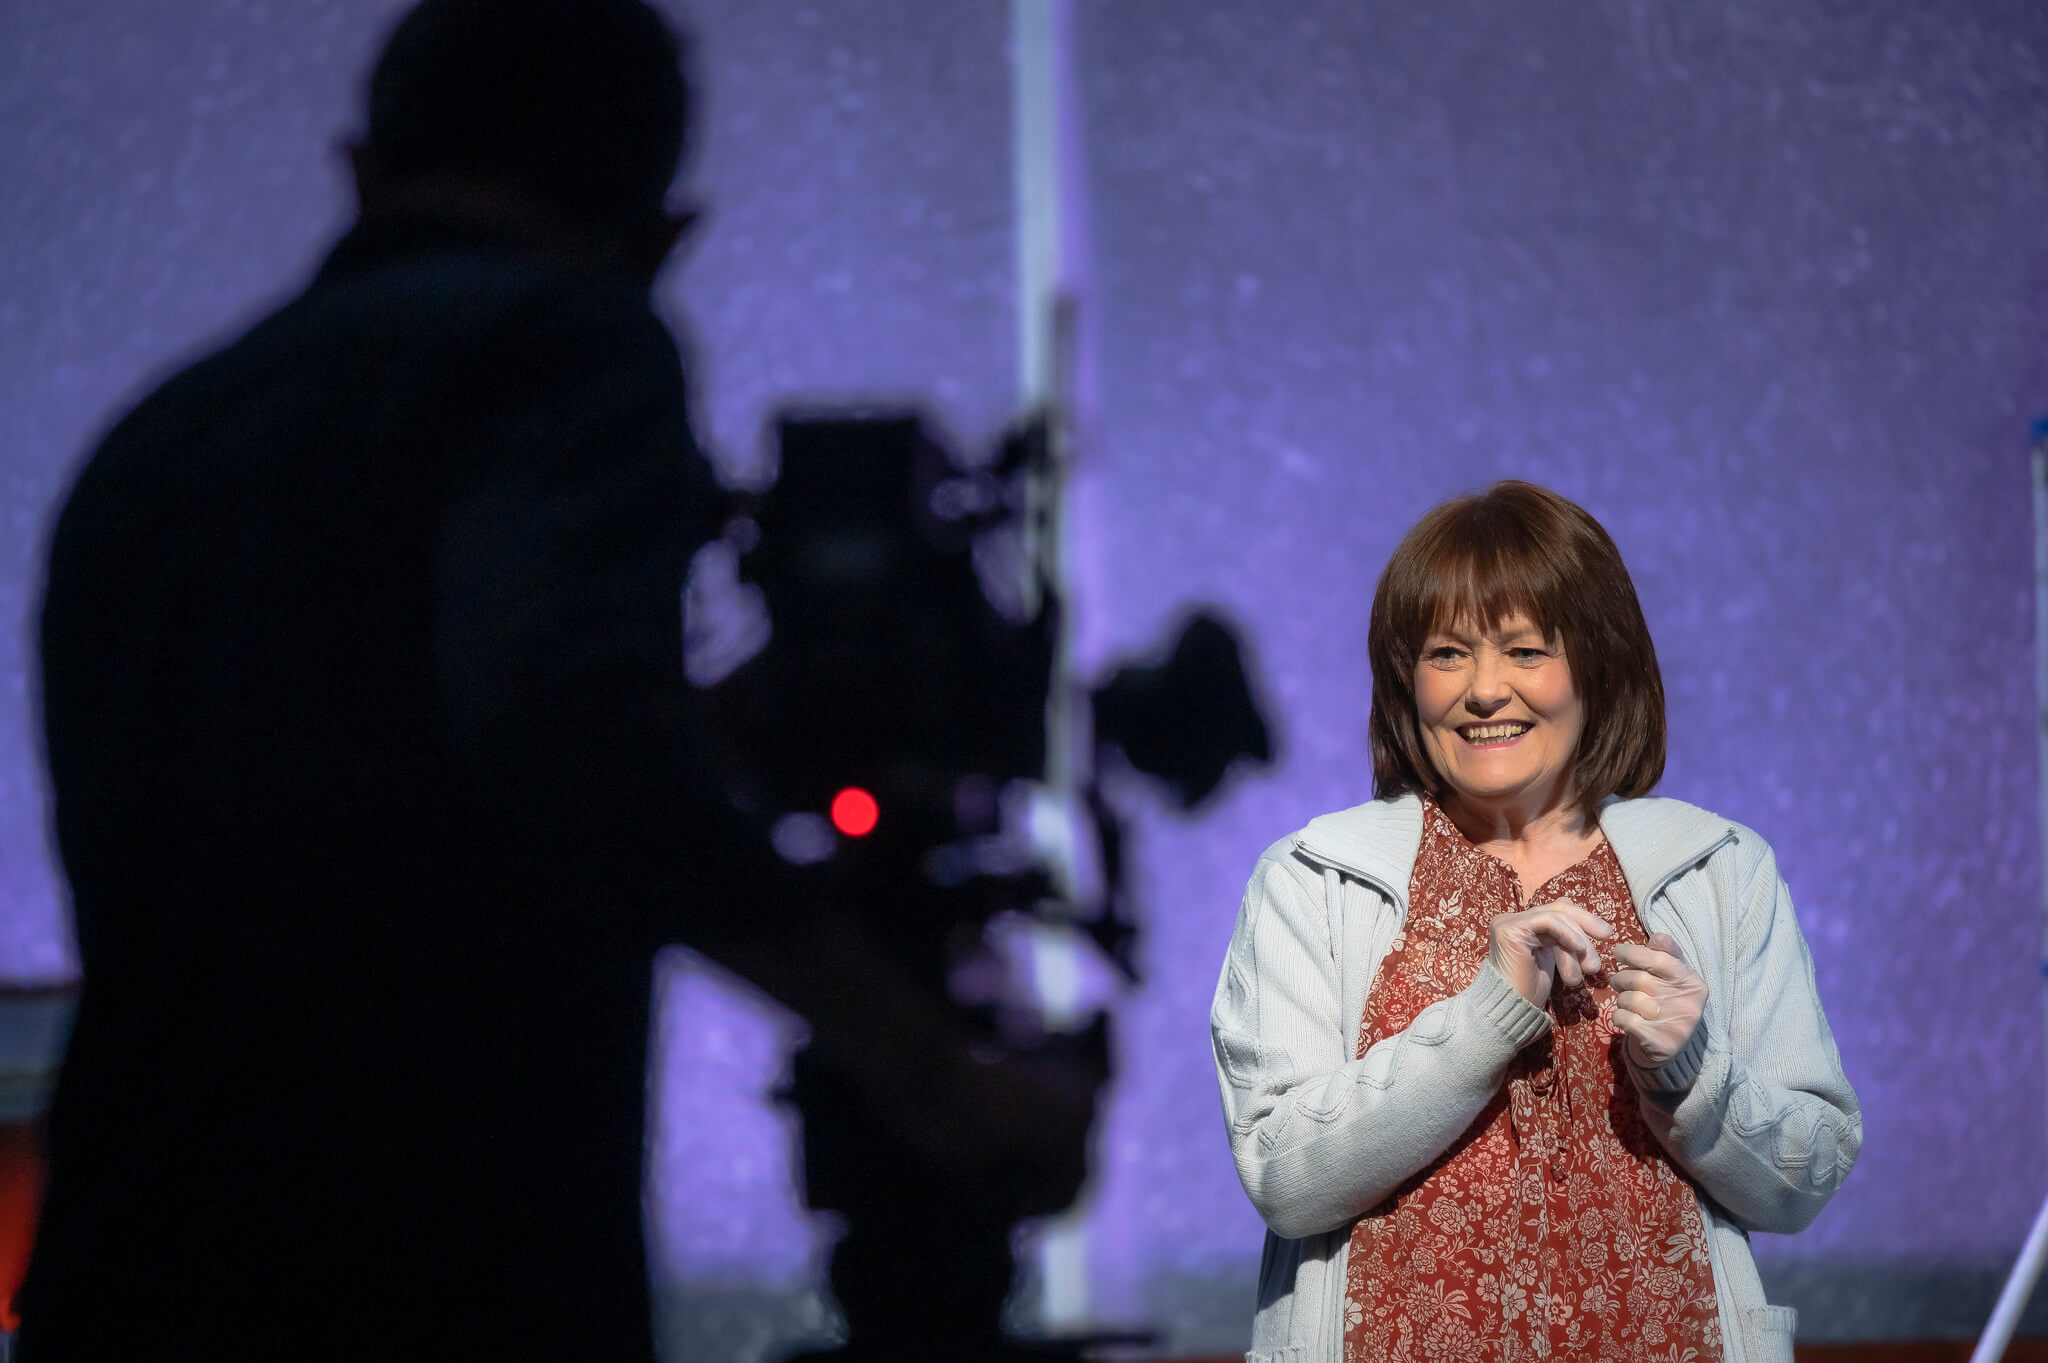 Rehearsal image for Fibres films showing Maureen Carr being filmed